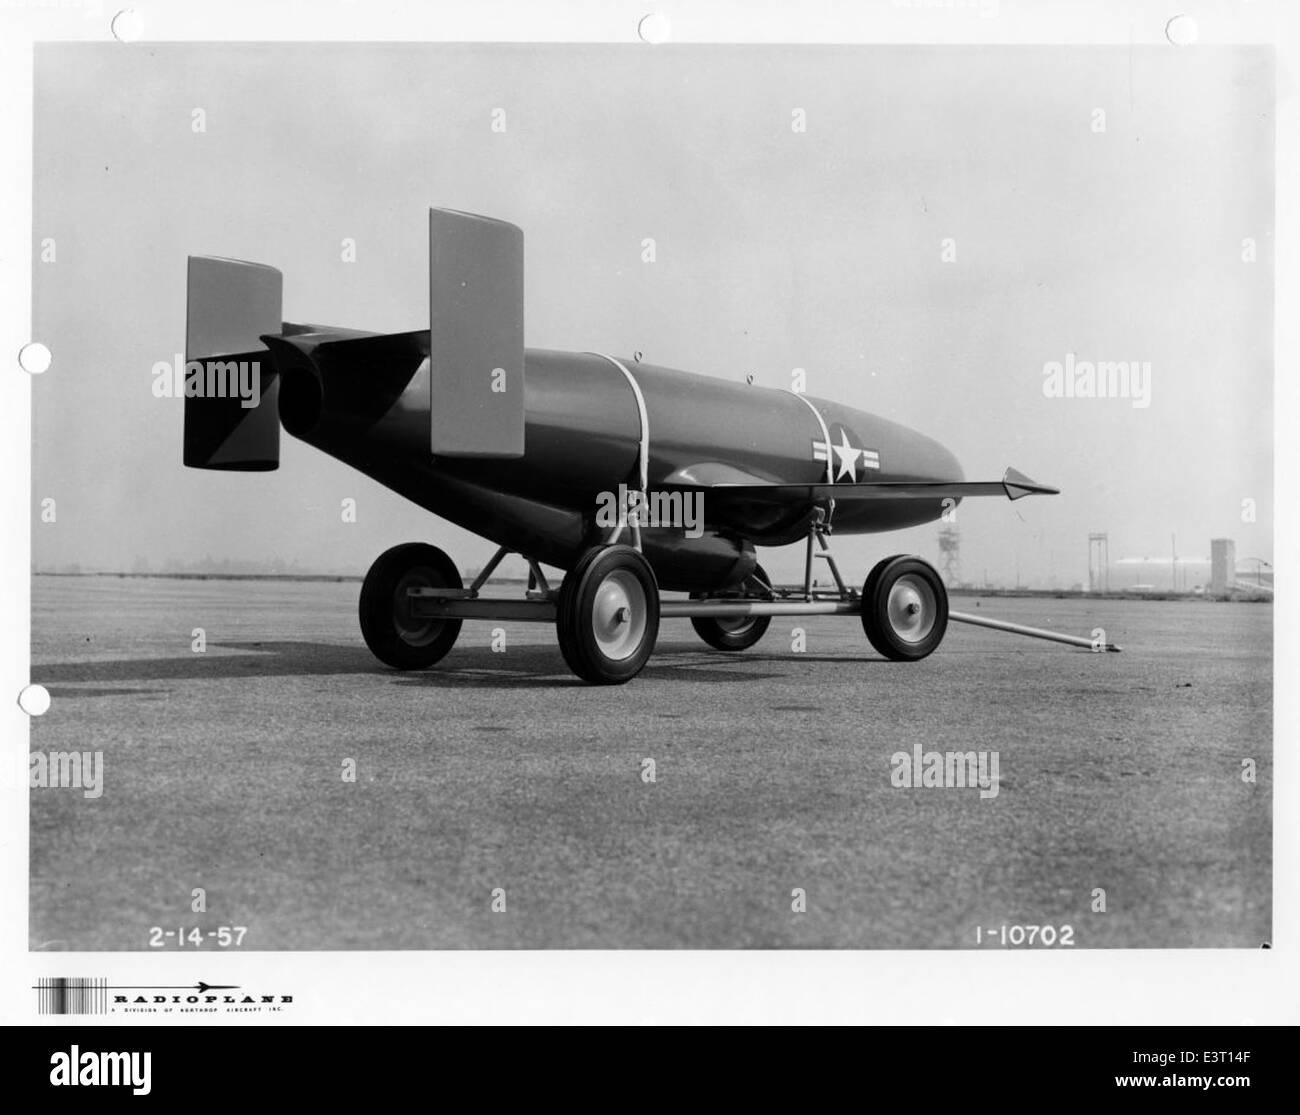 1-10702 1956-02-14 Radioplane RP-54D print scan - Stock Image